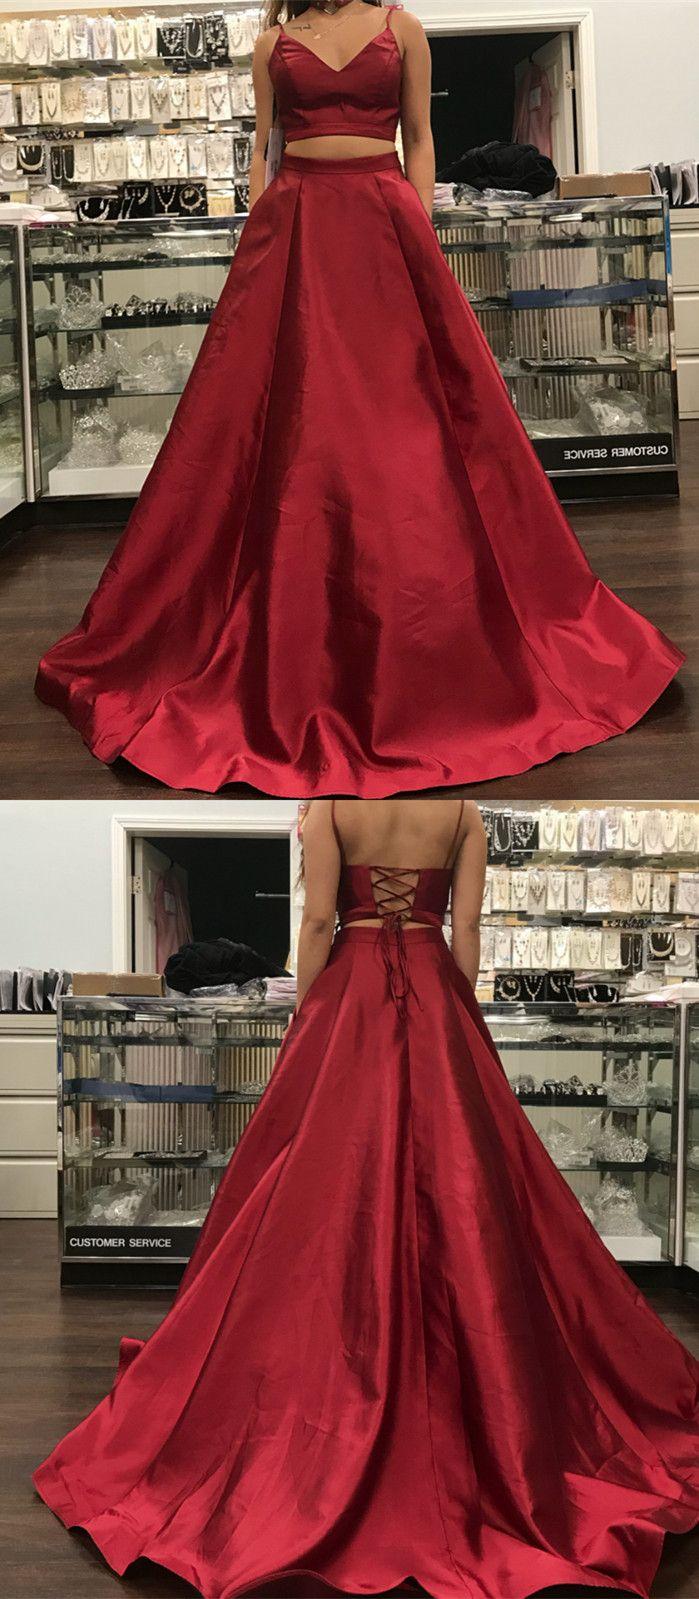 Spaghetti Straps V Neck Long Satin Prom Dresses Two Piece Burgundy Prom Dress Prom Dress Stores Satin Prom Dress [ 1599 x 699 Pixel ]